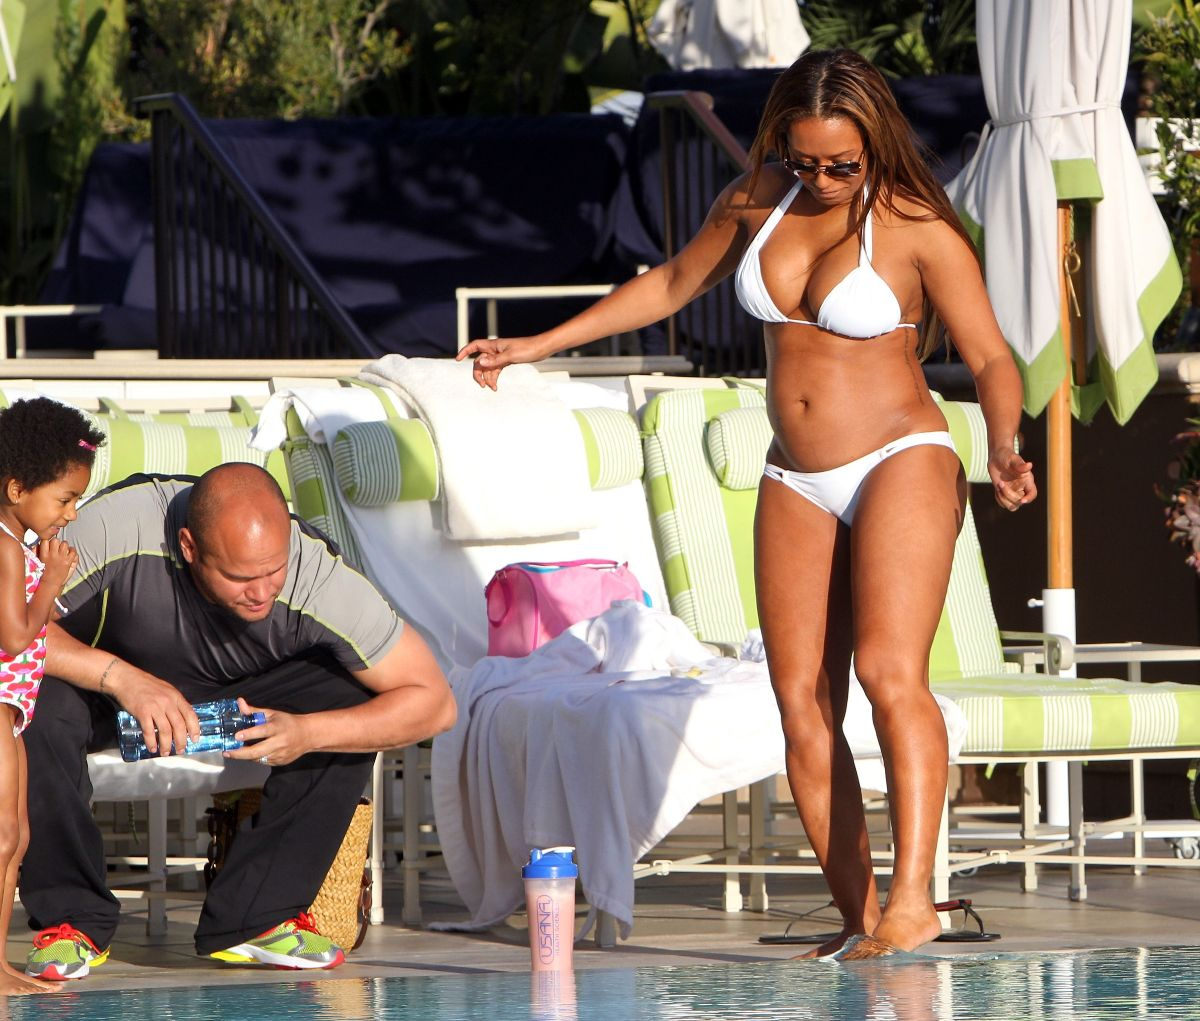 http://1.bp.blogspot.com/-k2_ySy1p_8I/TaXOHdq0cpI/AAAAAAAALW4/FbyJLUqdWso/s1600/Melanie-Brown-Pregnant-Bikini-Body-By-The-Poolside-In-LA-05.jpg